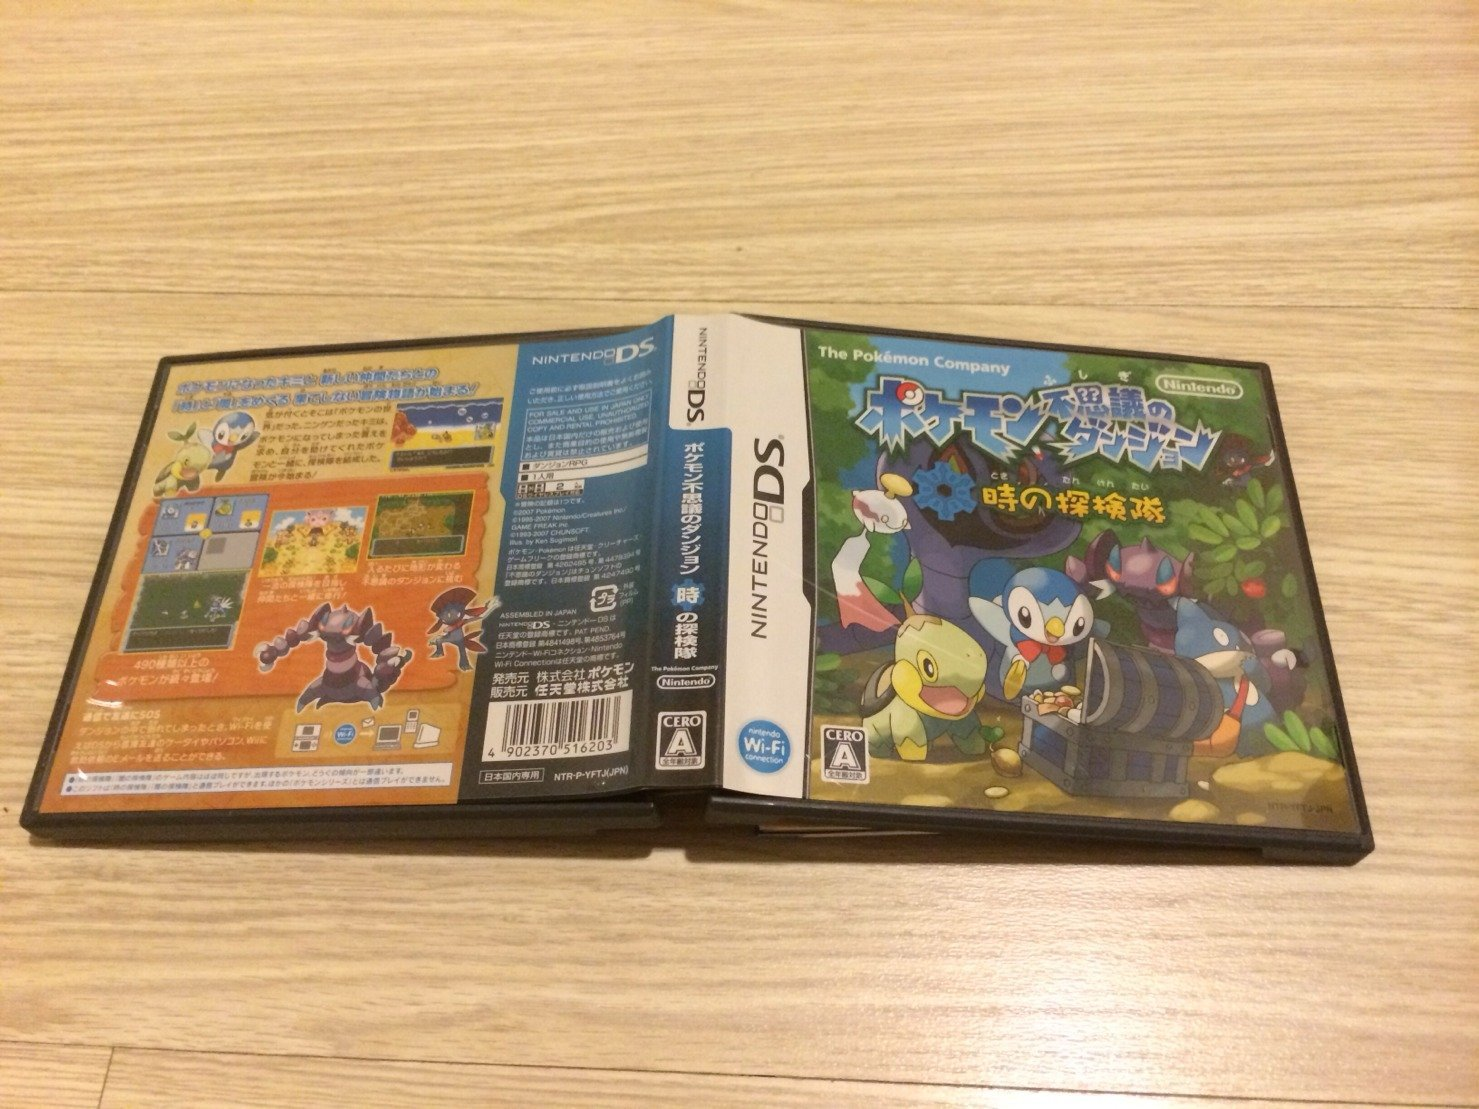 NDS 3DS N3DS 神奇寶貝 不可思議的迷宮 不思議迷宮 時之探險隊 非 青色救助隊 闇之探險隊 售 400